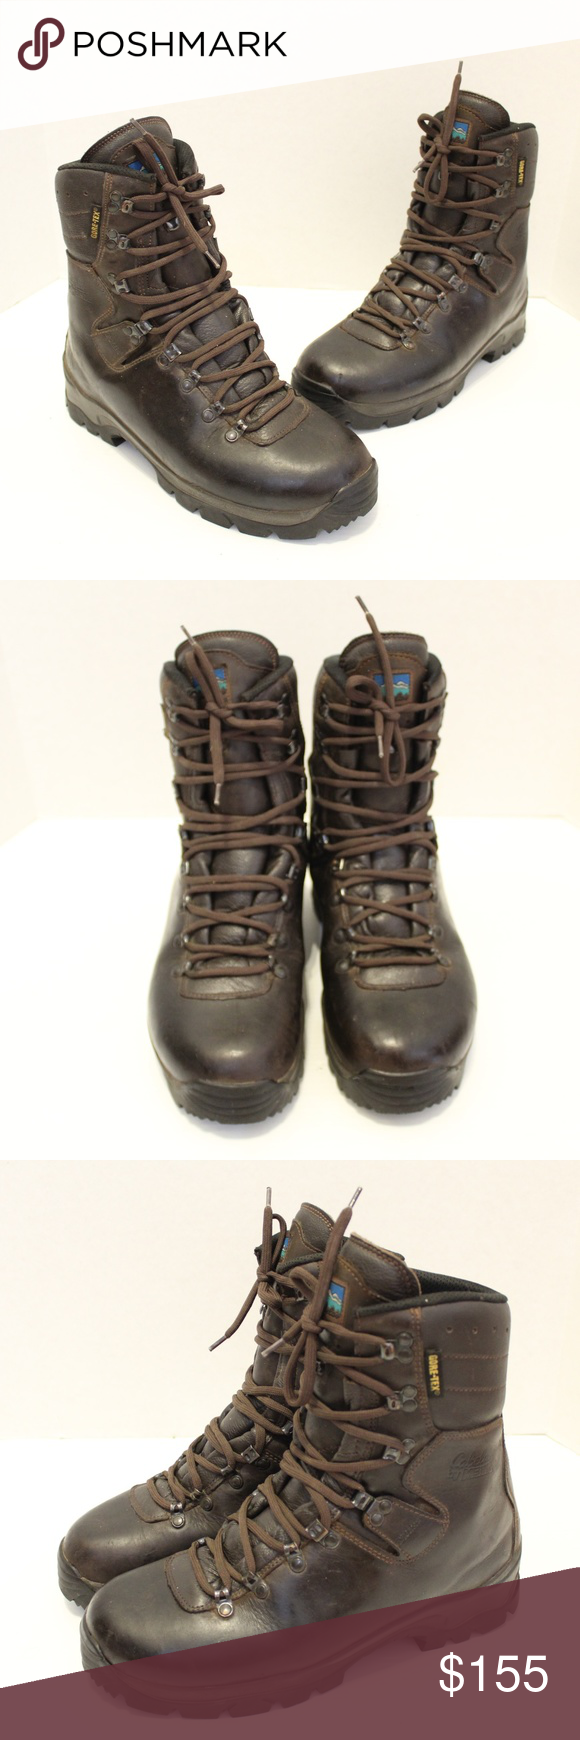 Cabelas Meindl Perfekt Hunter Leather